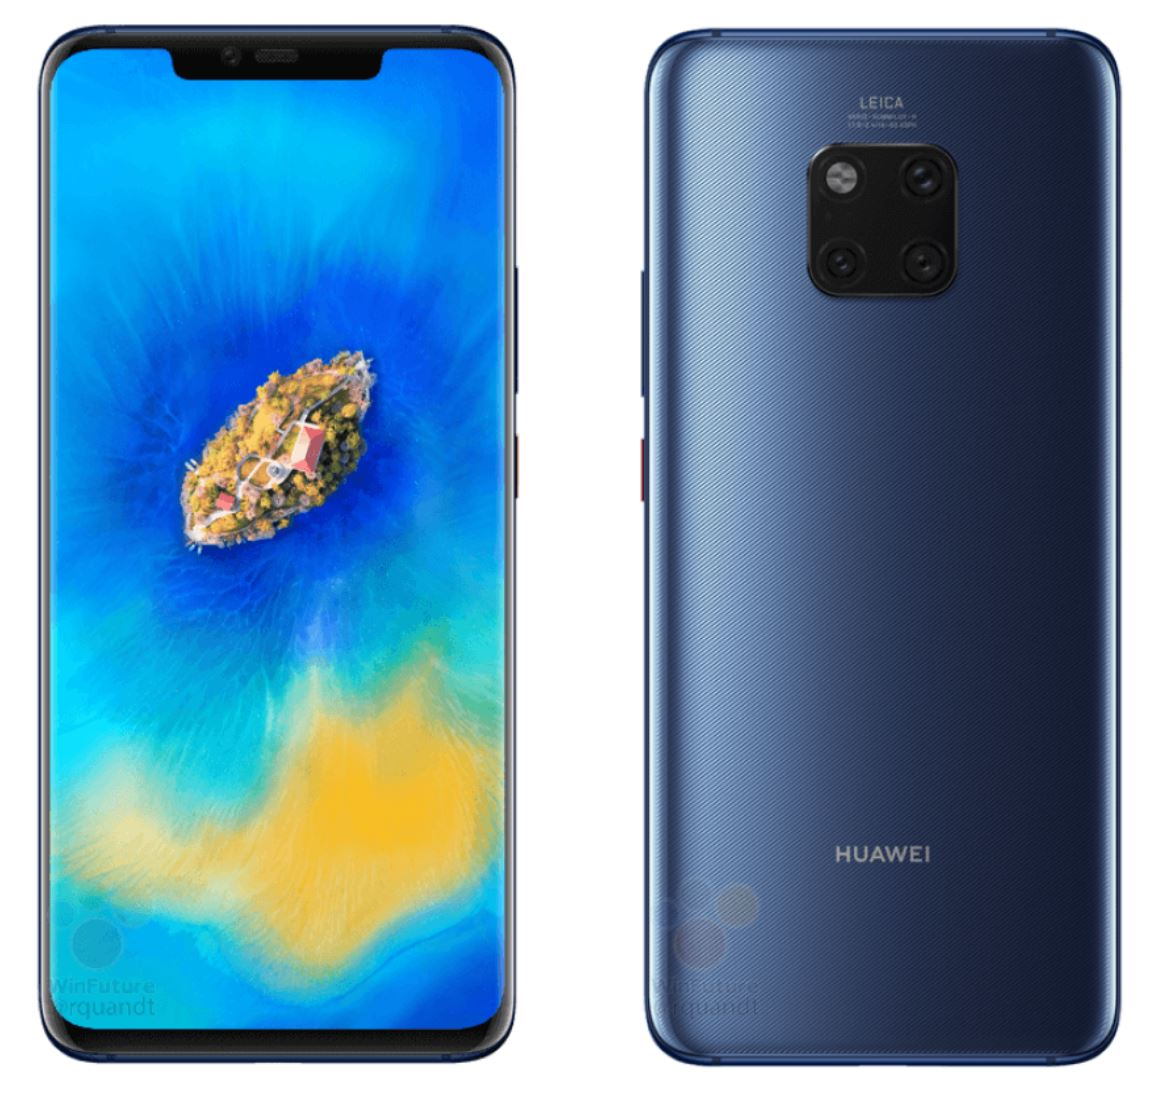 Huawei MATE 20 Pro IMAGINI OFICIALE 2